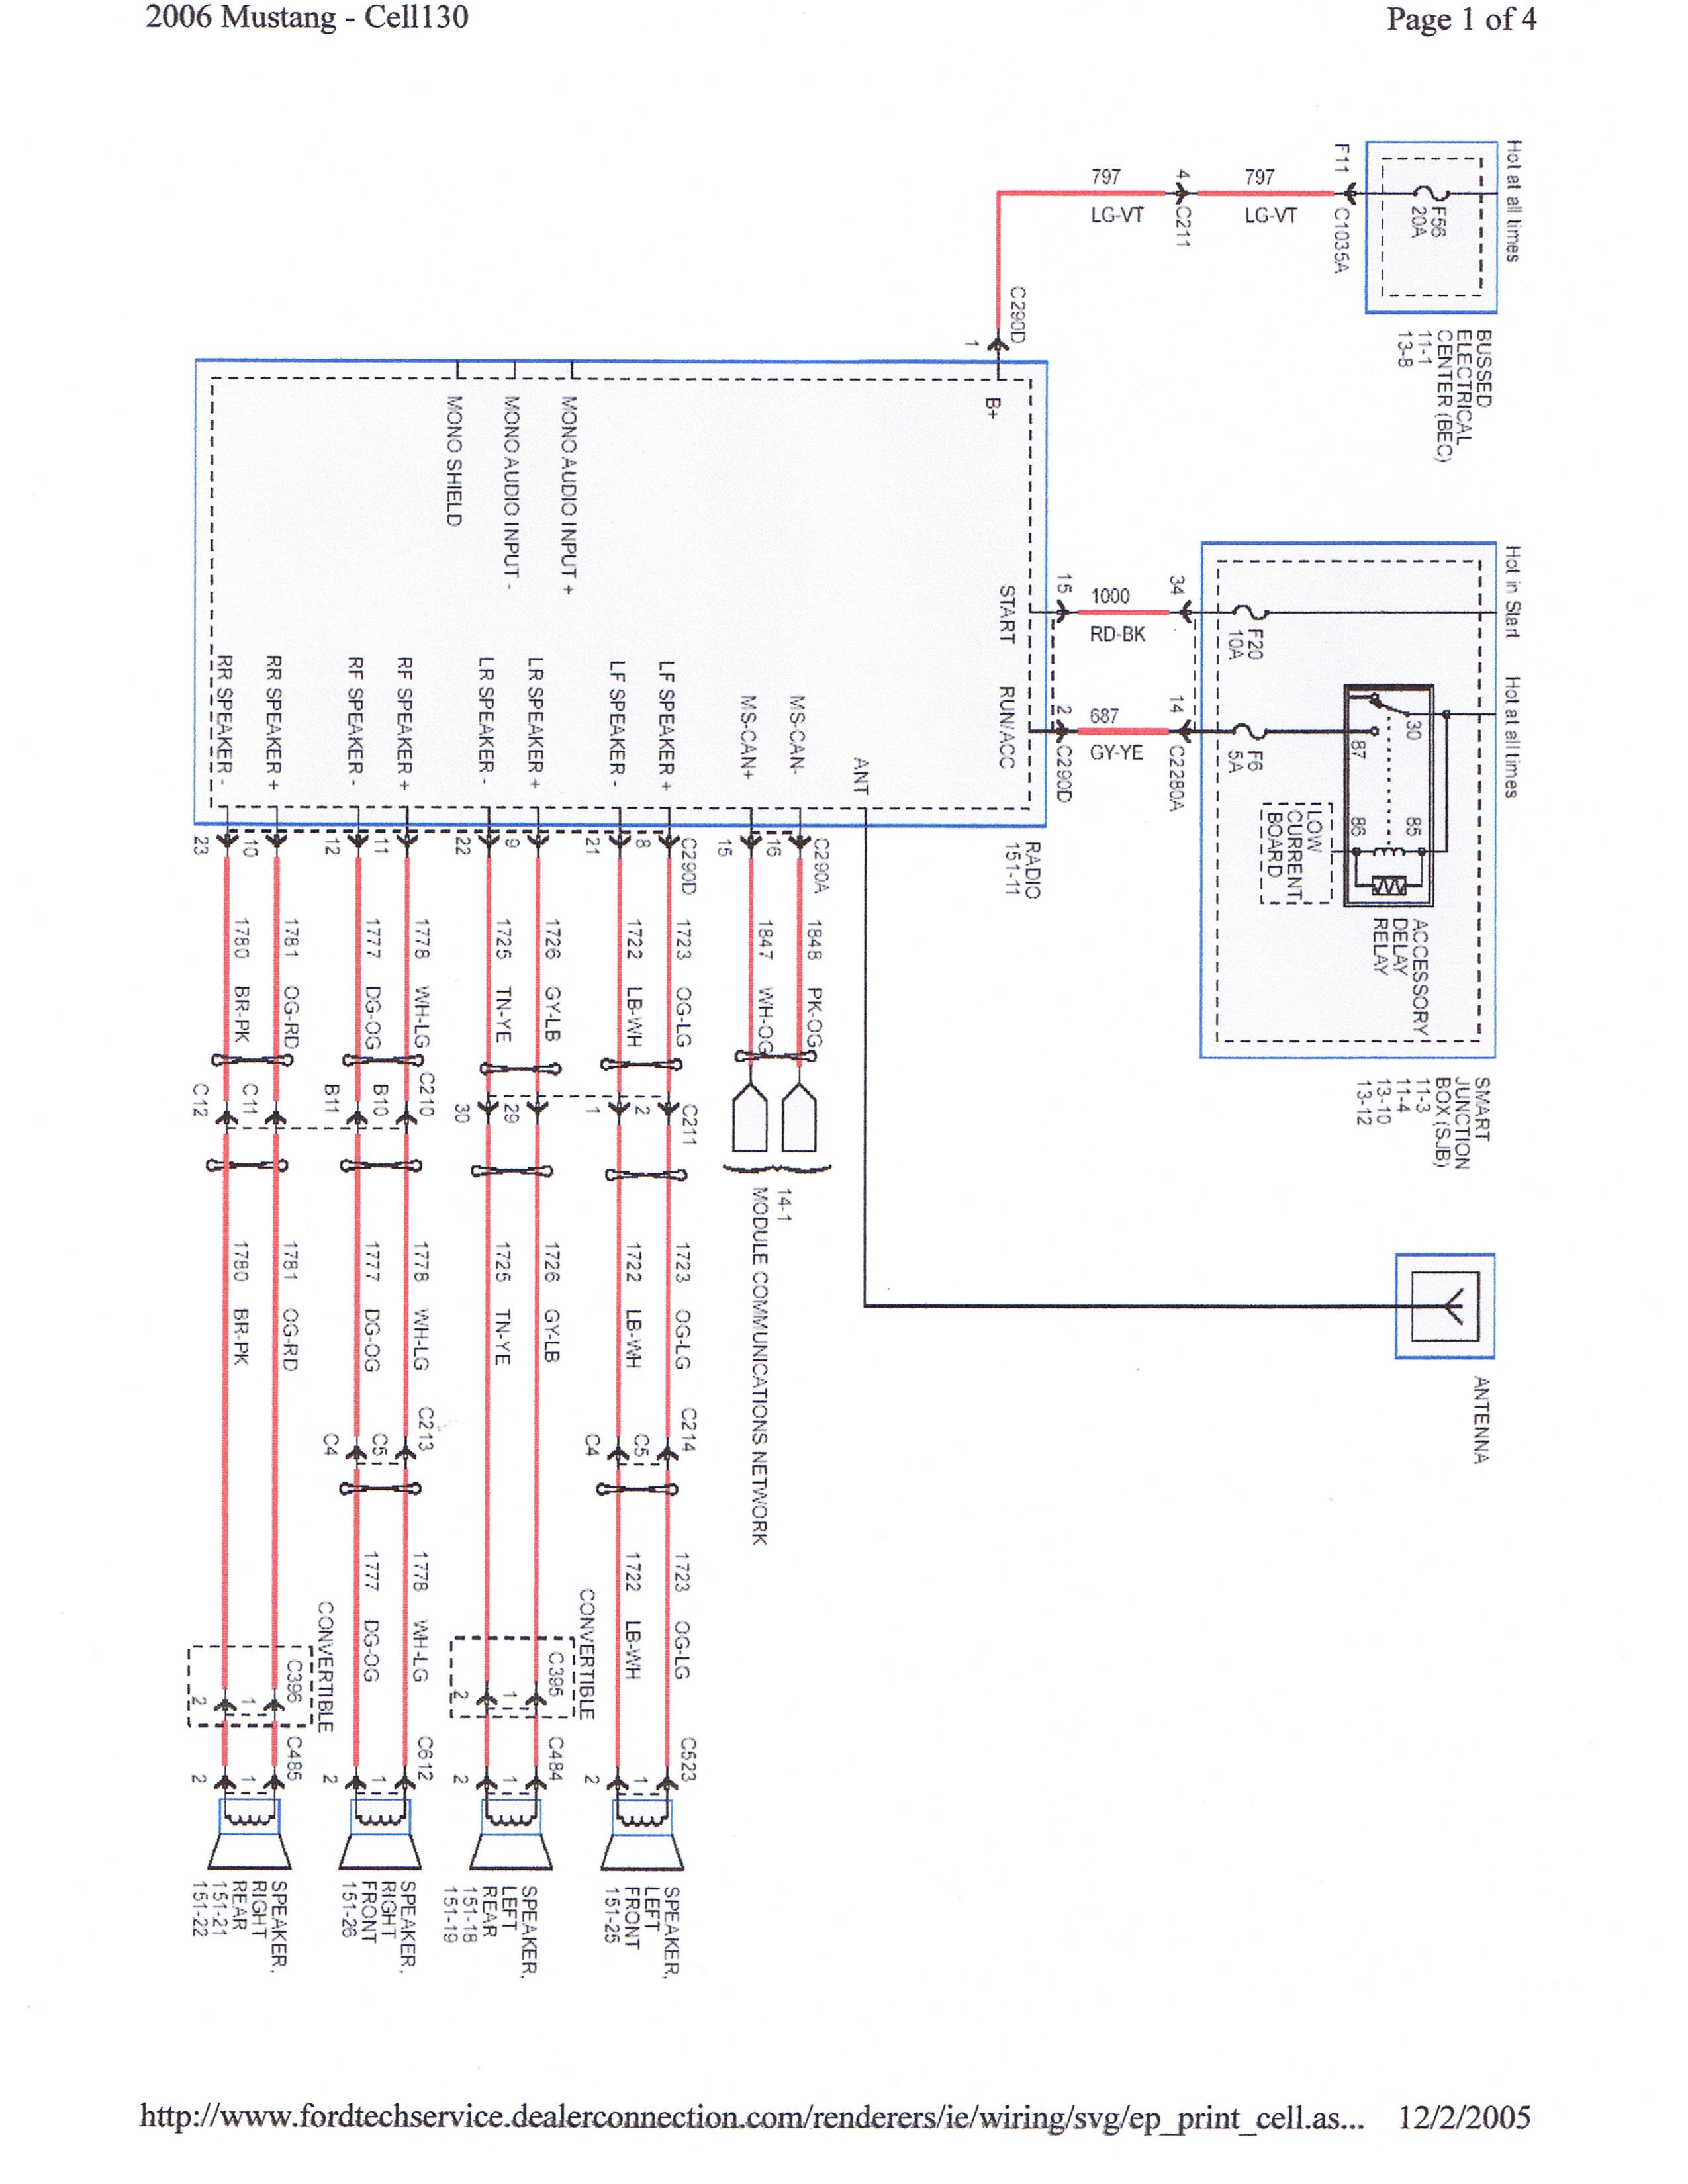 Shaker 500 Stereo Wiring Diagram - Hollow Body Bass Guitar Wiring Diagram -  valkyrie.lalu.decorresine.itWiring Diagram Resource